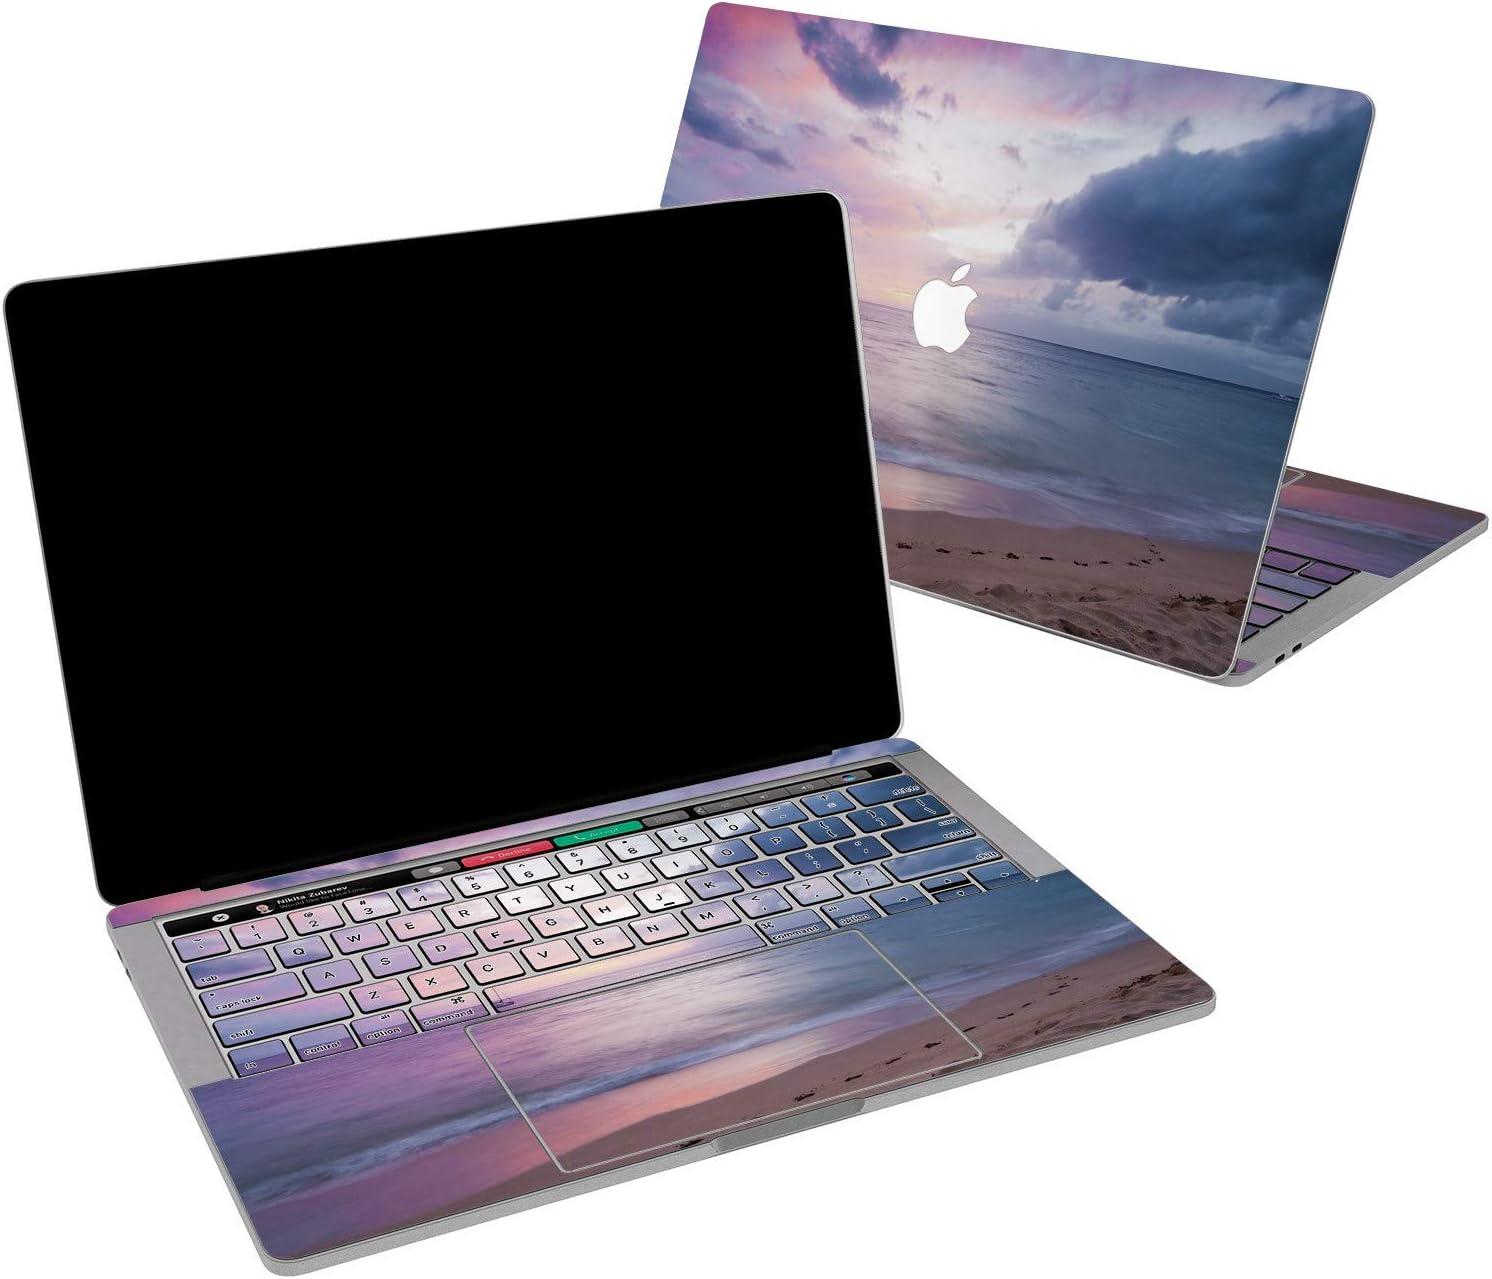 Lex Altern Vinyl Skin for MacBook Air 13 inch Mac Pro 16 15 Retina 12 11 2020 2019 2018 2017 Pink Purple Seaside Beach Ocean Sky Natural Purple Print Laptop Cover Keyboard Decal Sticker Design